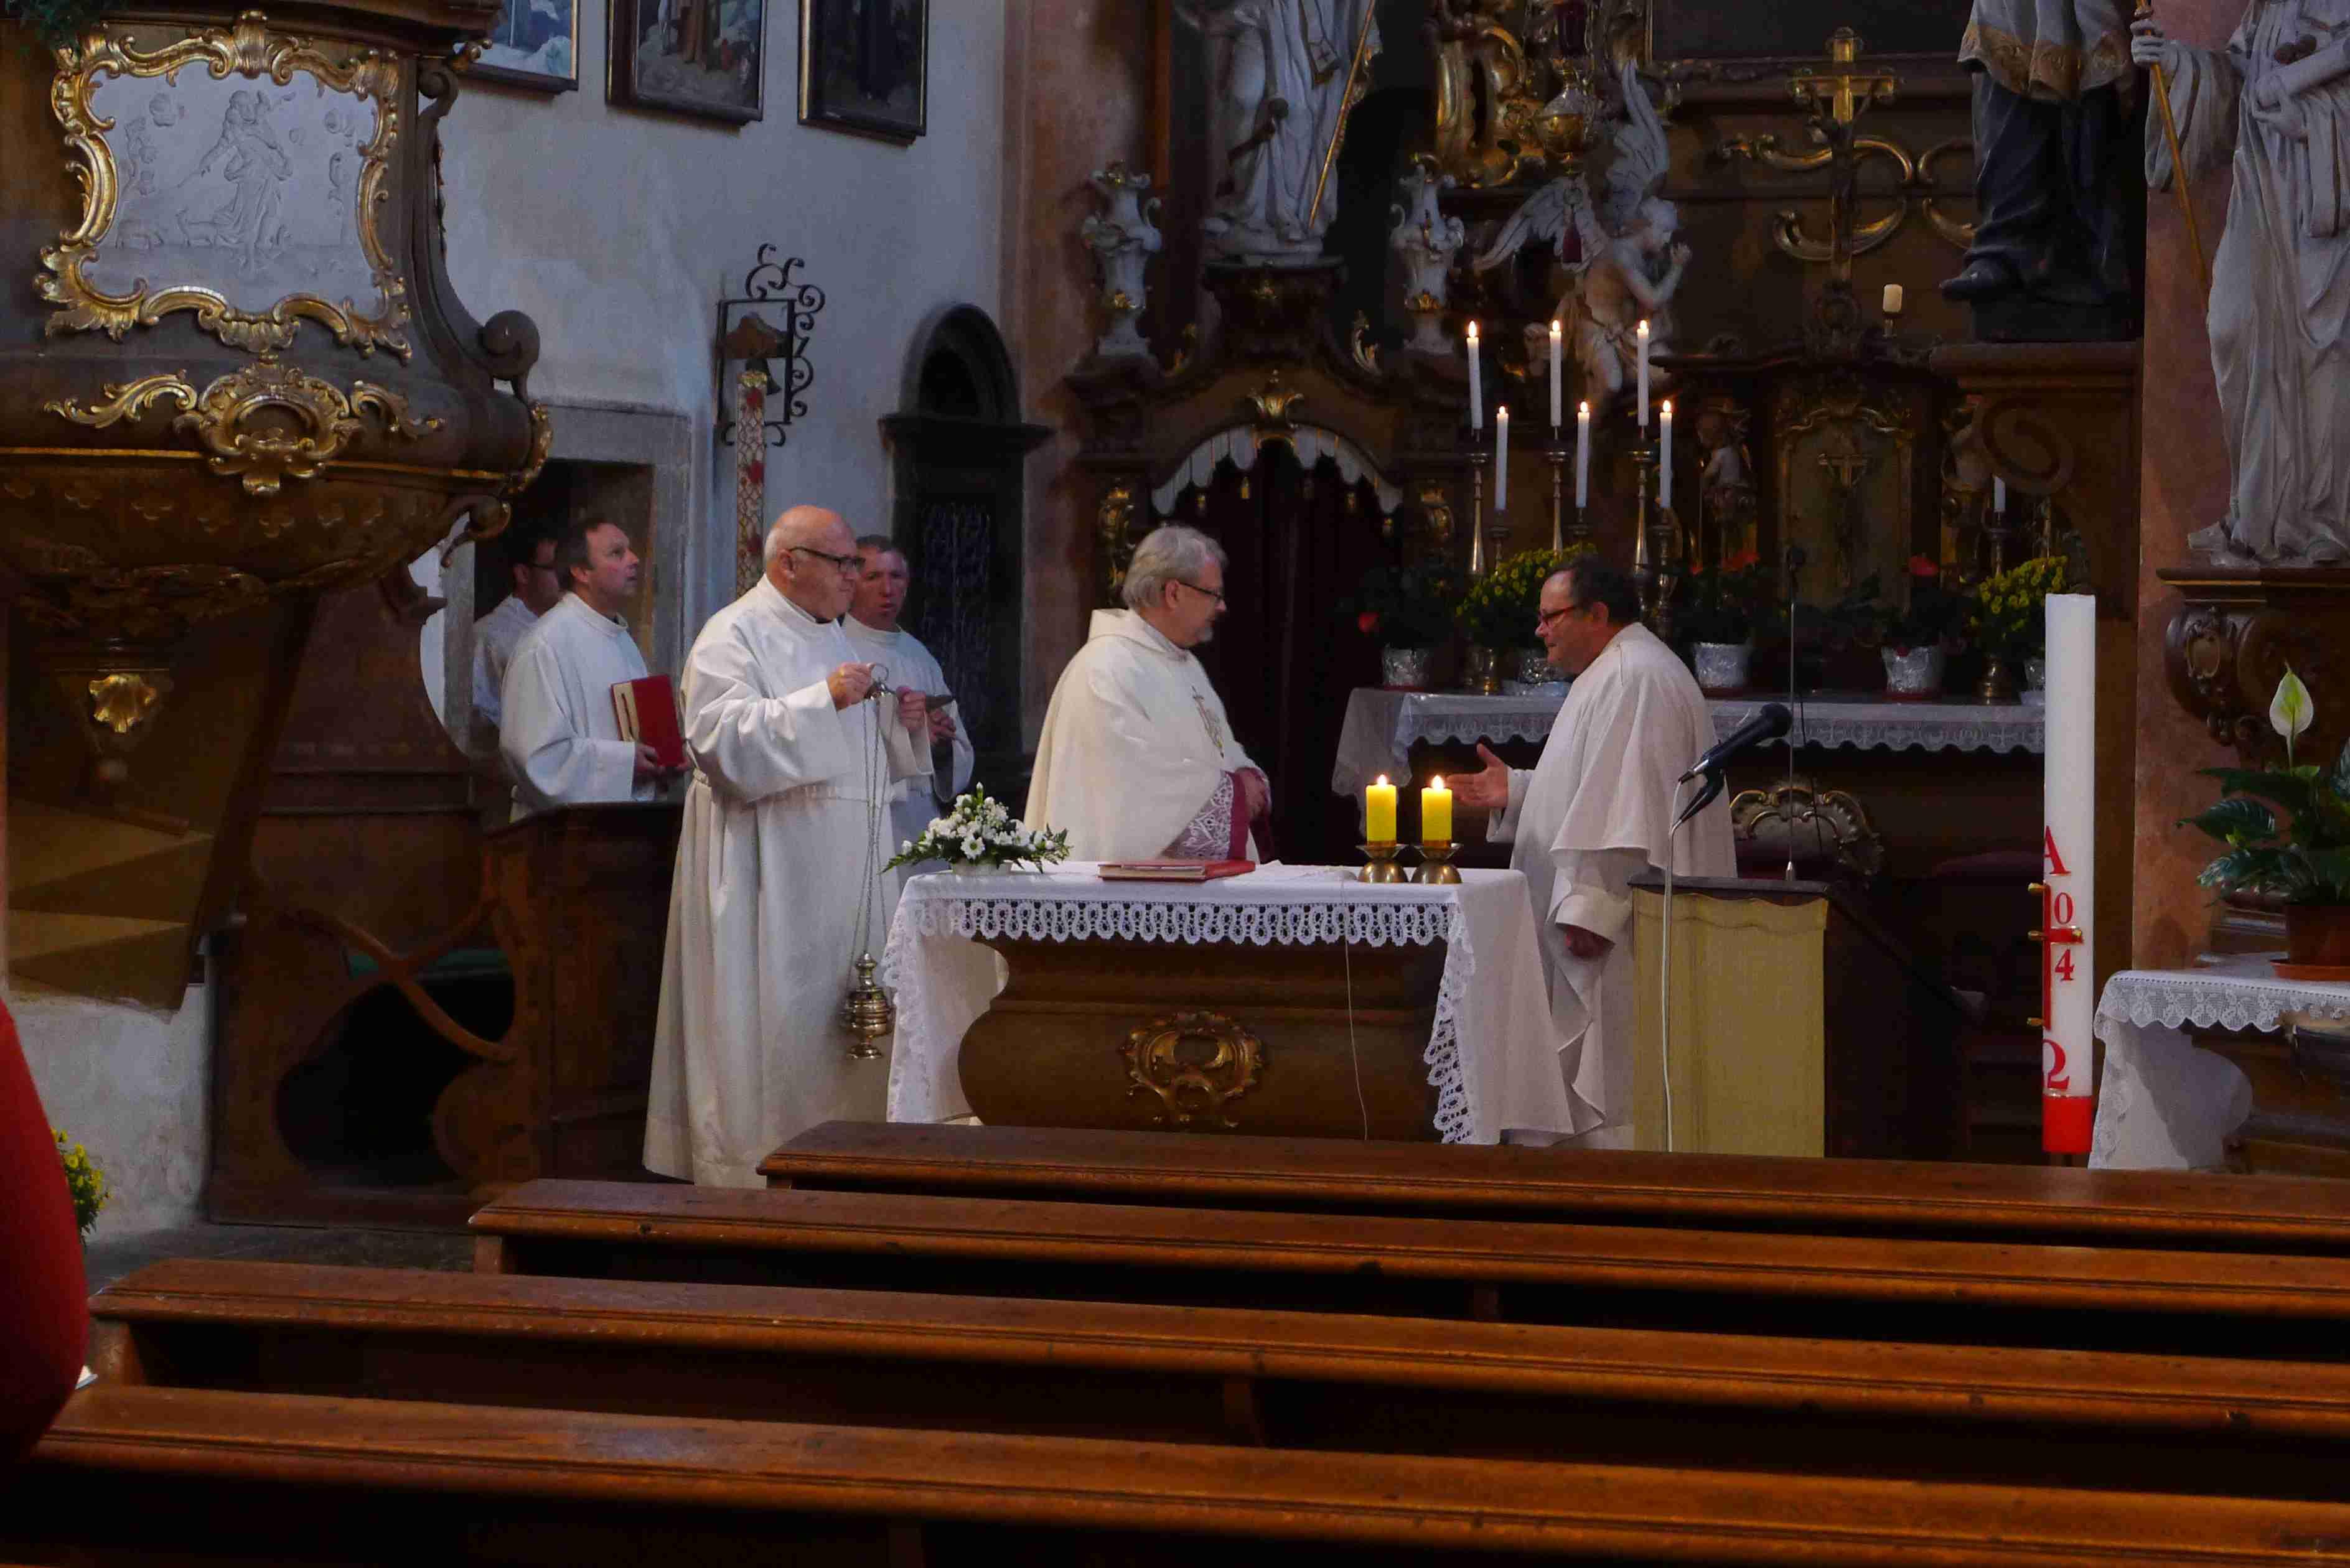 pouť ke sv. Františku 2014 - pátek - 3